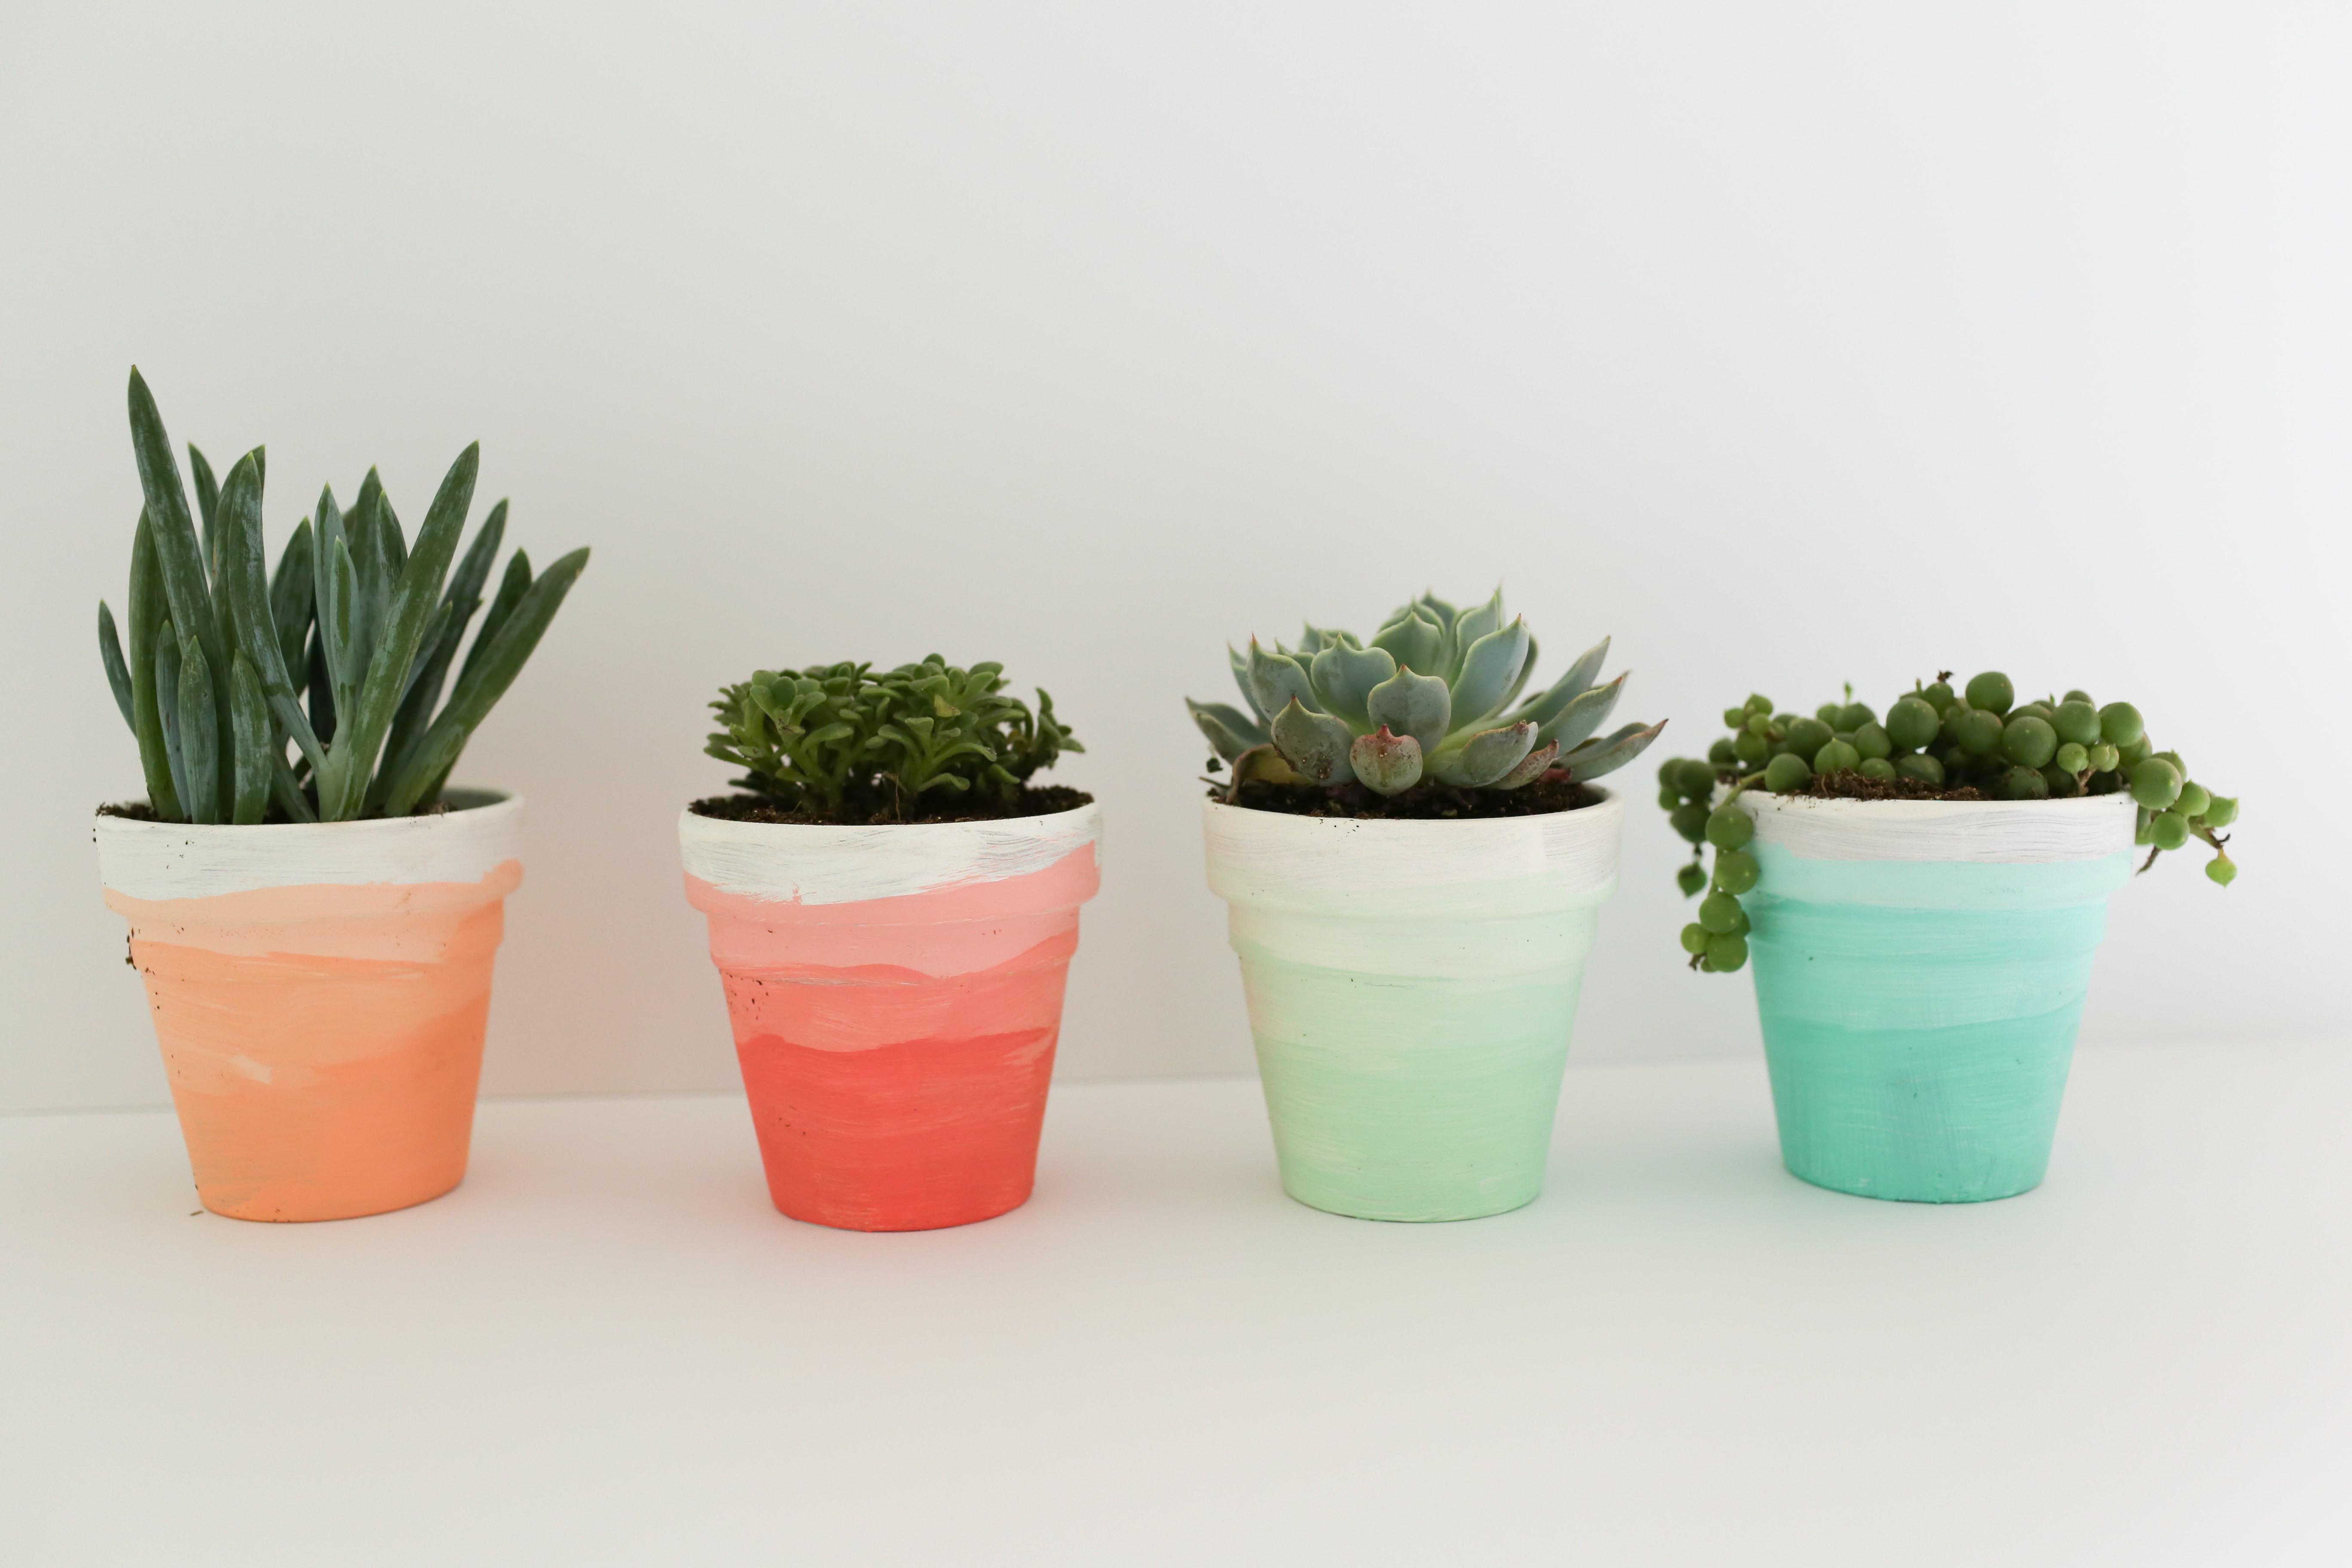 Ombre Succulent Planters | A DIY